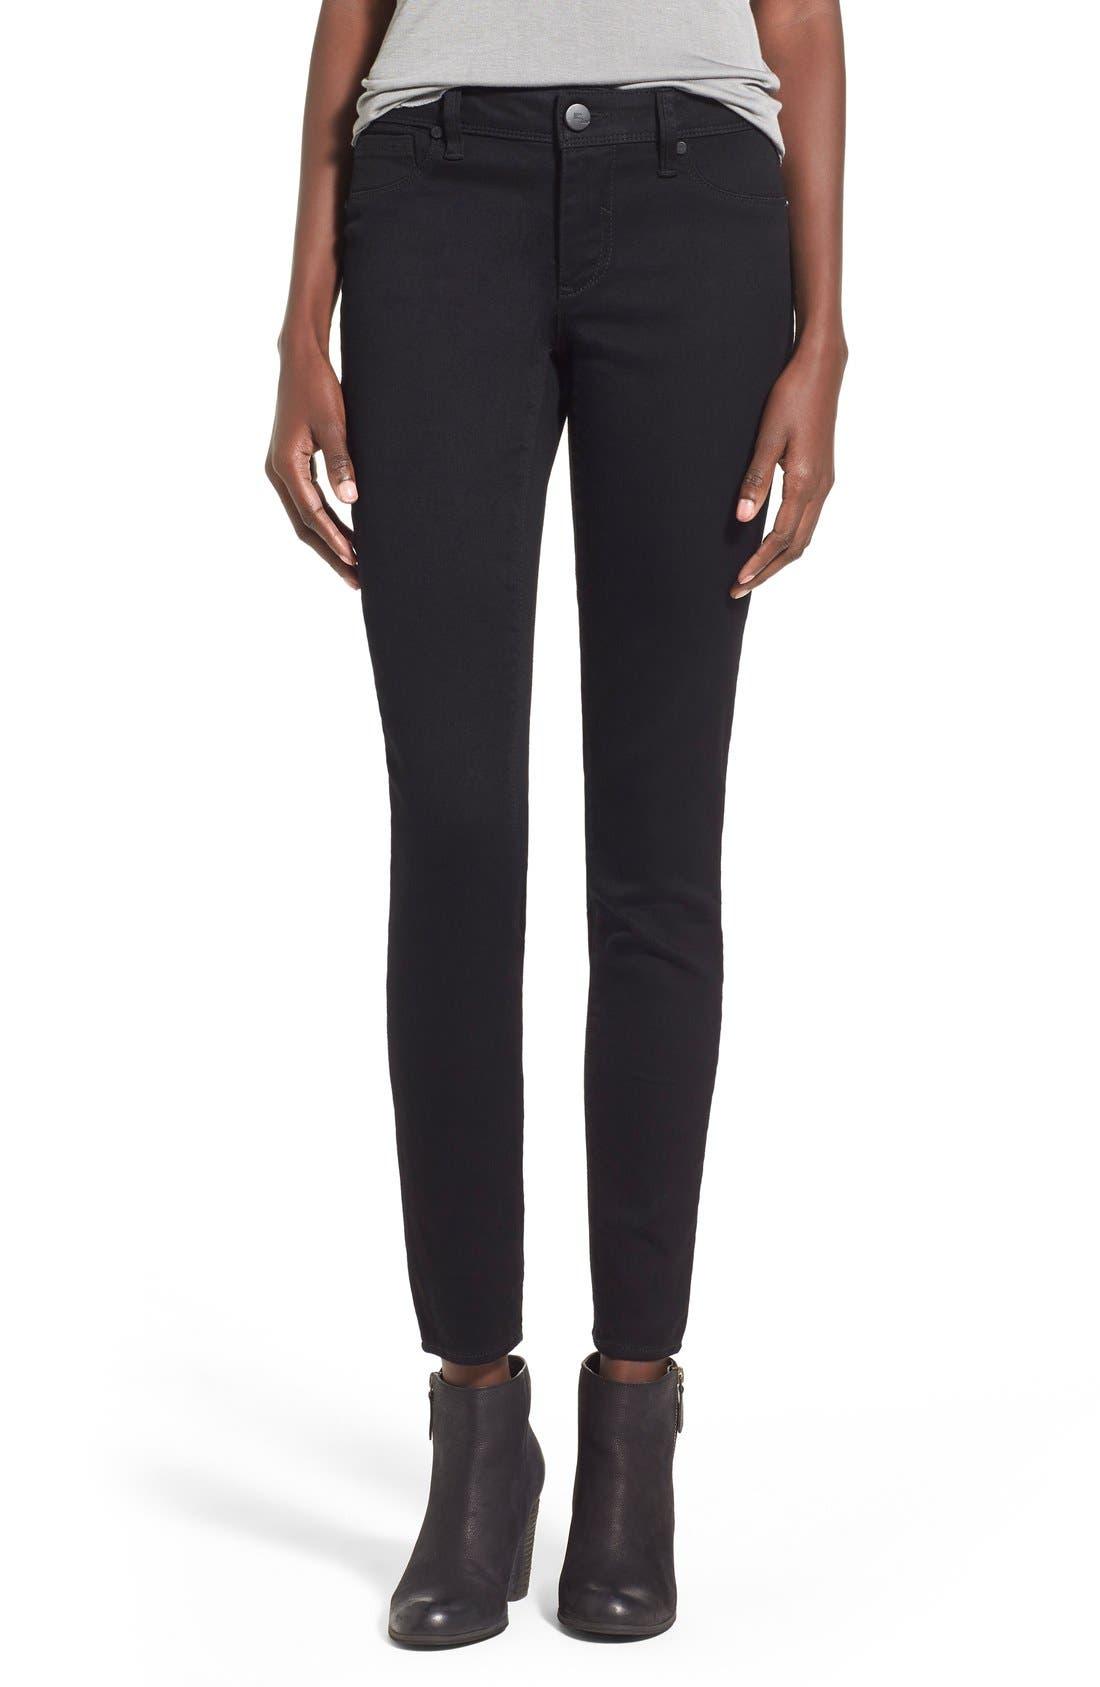 Butter Skinny Jeans,                         Main,                         color, BLACK